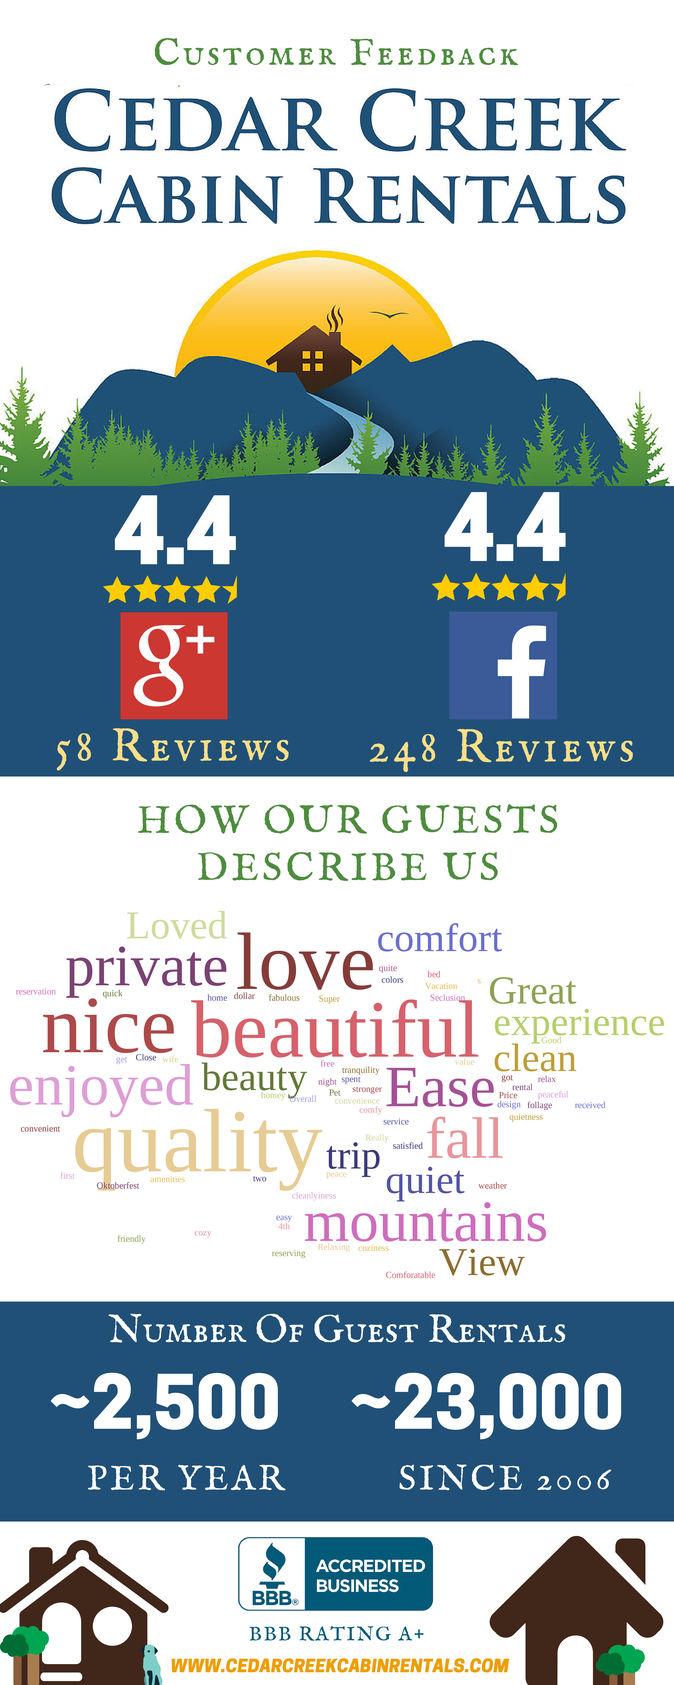 Cedar-Creek-Cabin-Rentals-Reviews-3